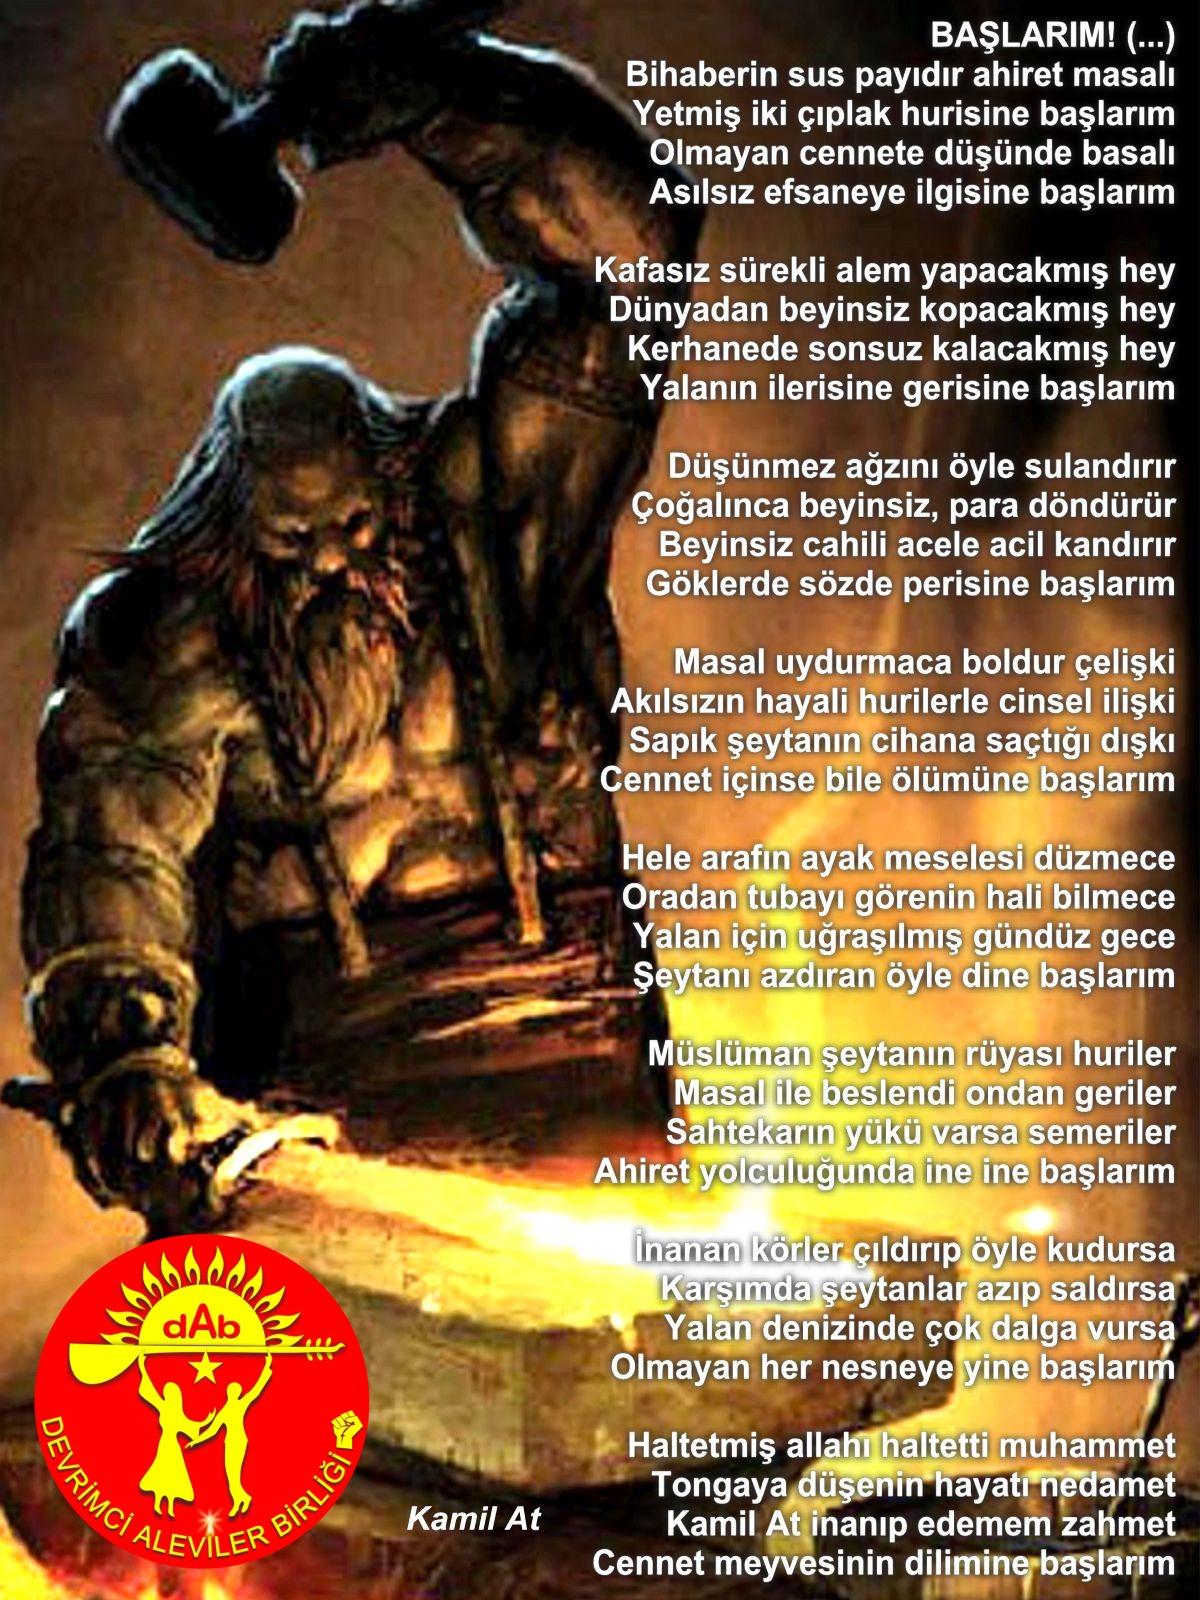 Alevi Bektaşi Kızılbaş Pir Sultan Devrimci Aleviler Birliği DAB baslarim kamil at siir